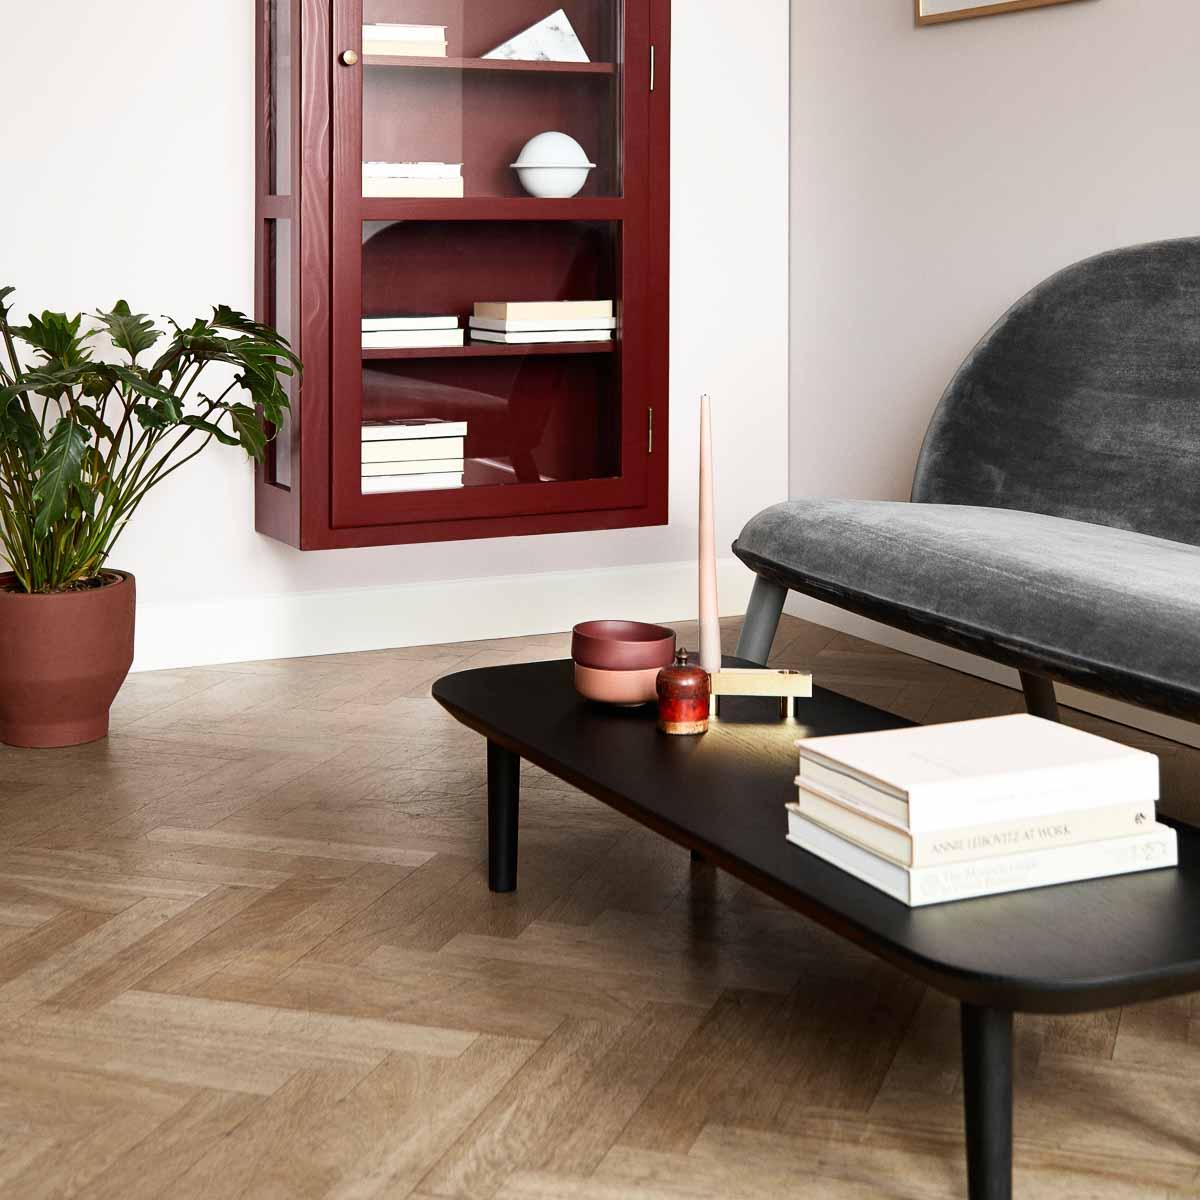 Coffee Table von Lindebjerg Design-4